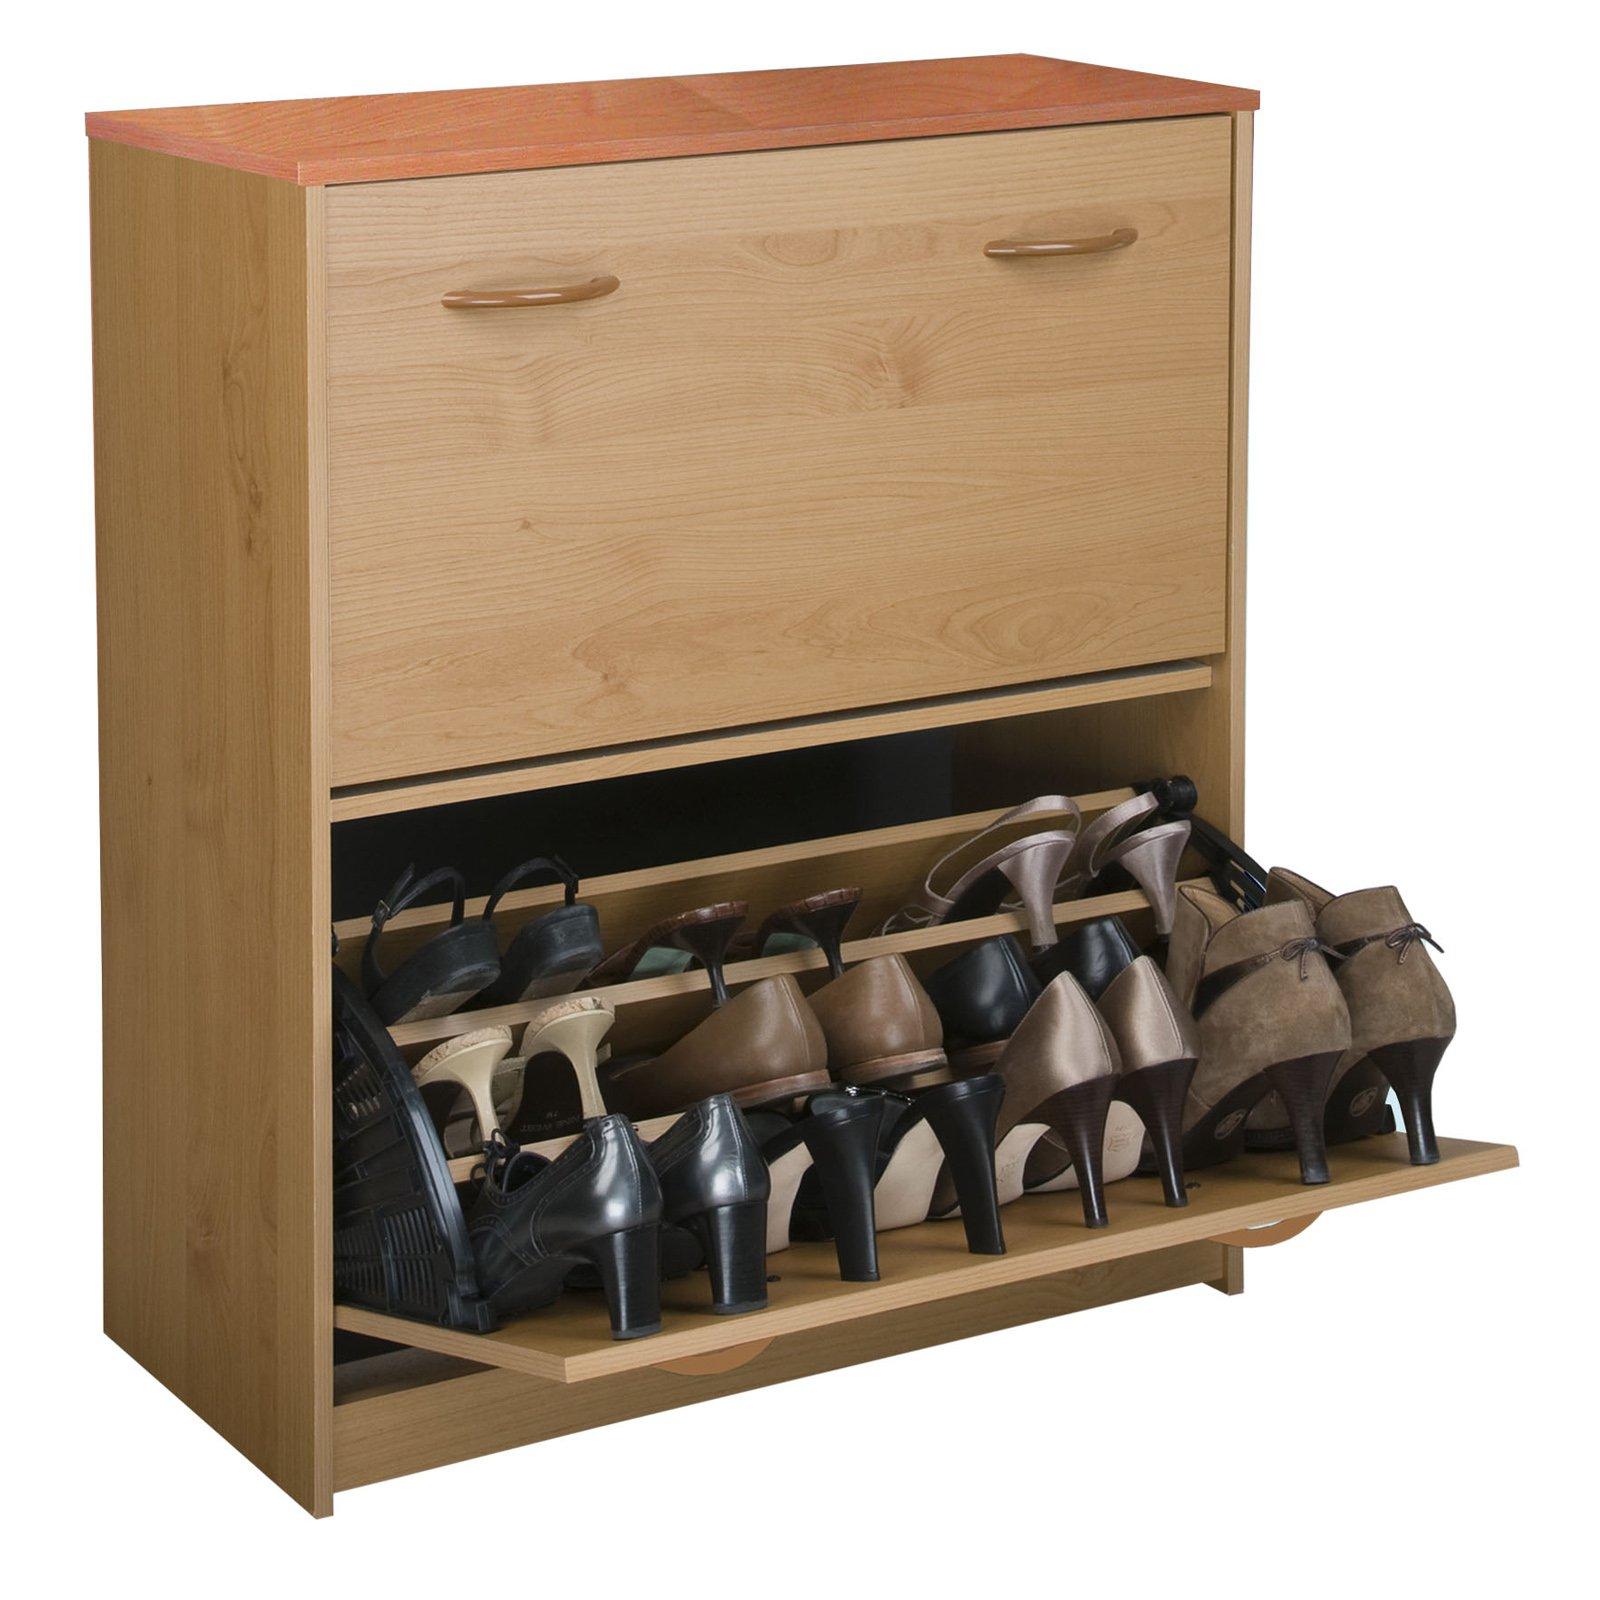 Venture Horizon Double Level Shoe Storage Cabinet